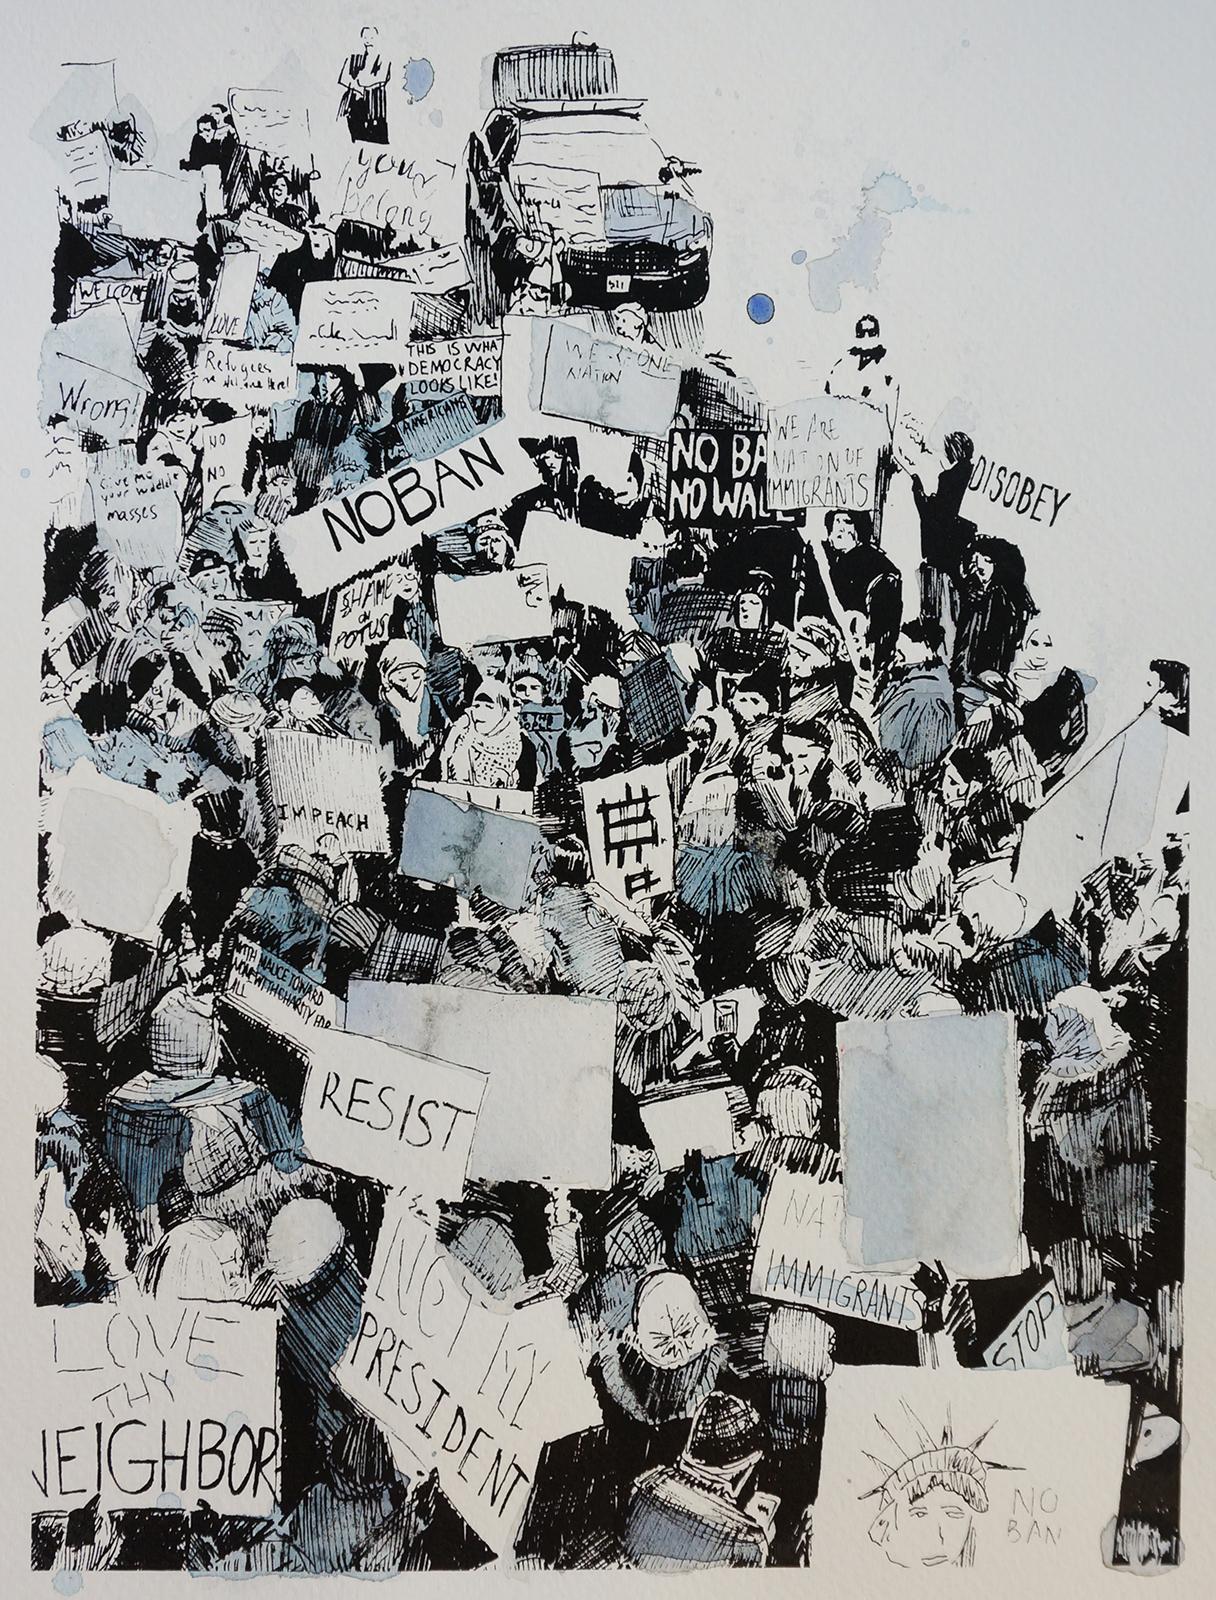 Ape_Bleakney_March Mixed Media - 'No Ban (6)', 9.5''x12.5'', Screen Print + Watercolor, 2018 copy.jpg